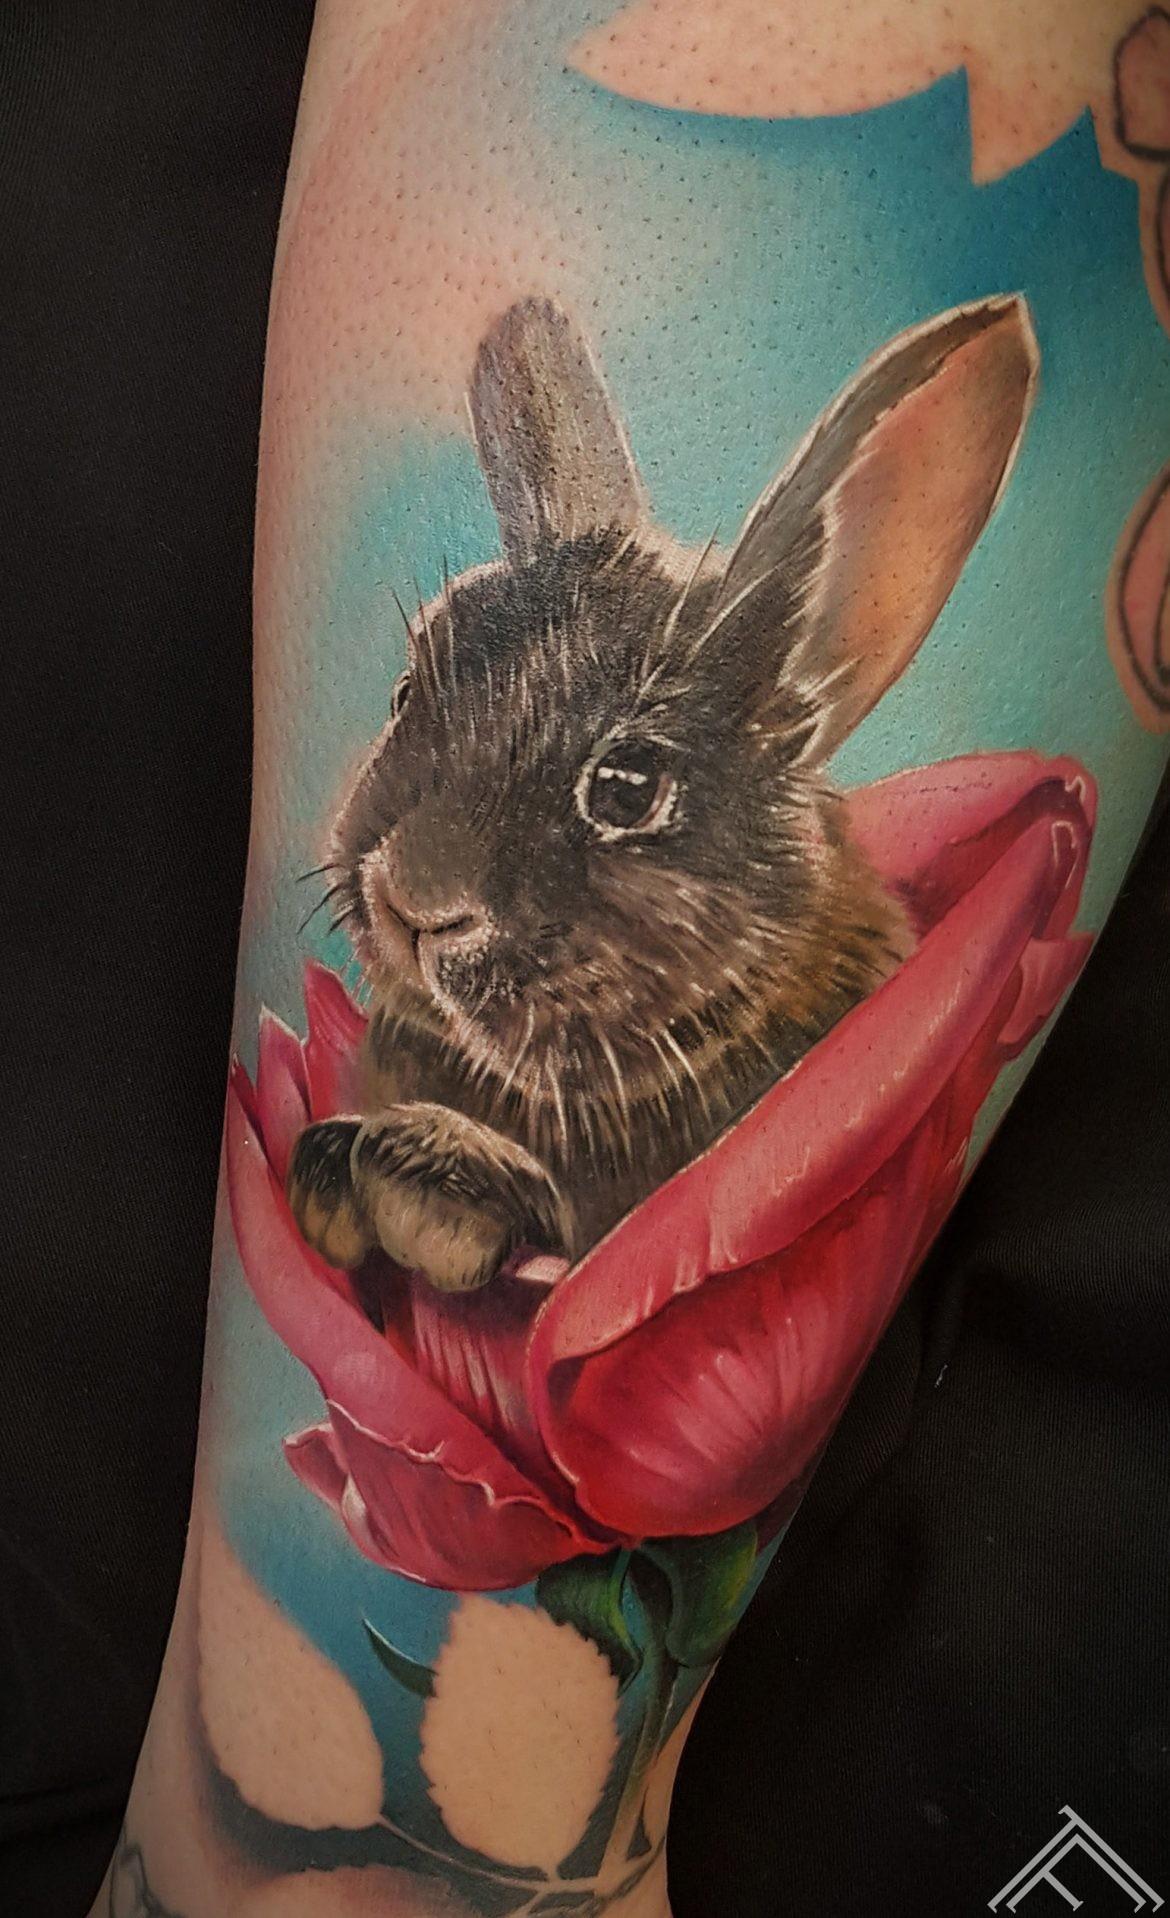 trusis-rabit-zakis-tattoo-tattoofrequency-tetovejums-riga-marispavlo-zakis-burkans